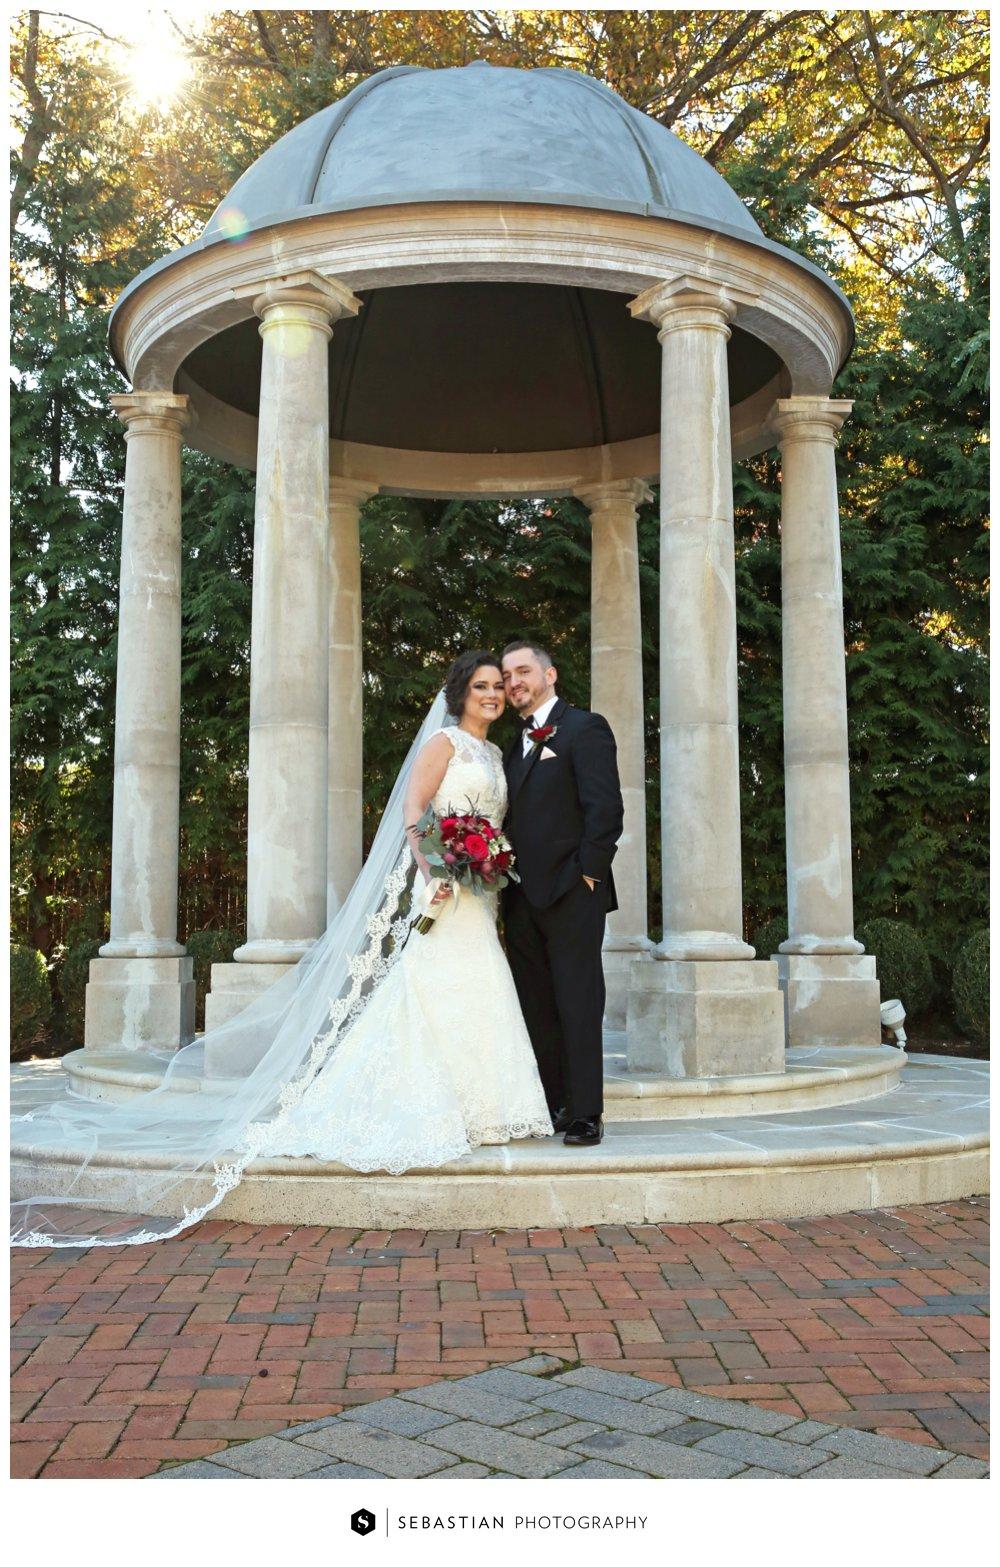 Sebastian Photography_NJ Wedding_NJWedding Photographer_Fall Wedding_The Estate at Florentine Gardens_7035.jpg